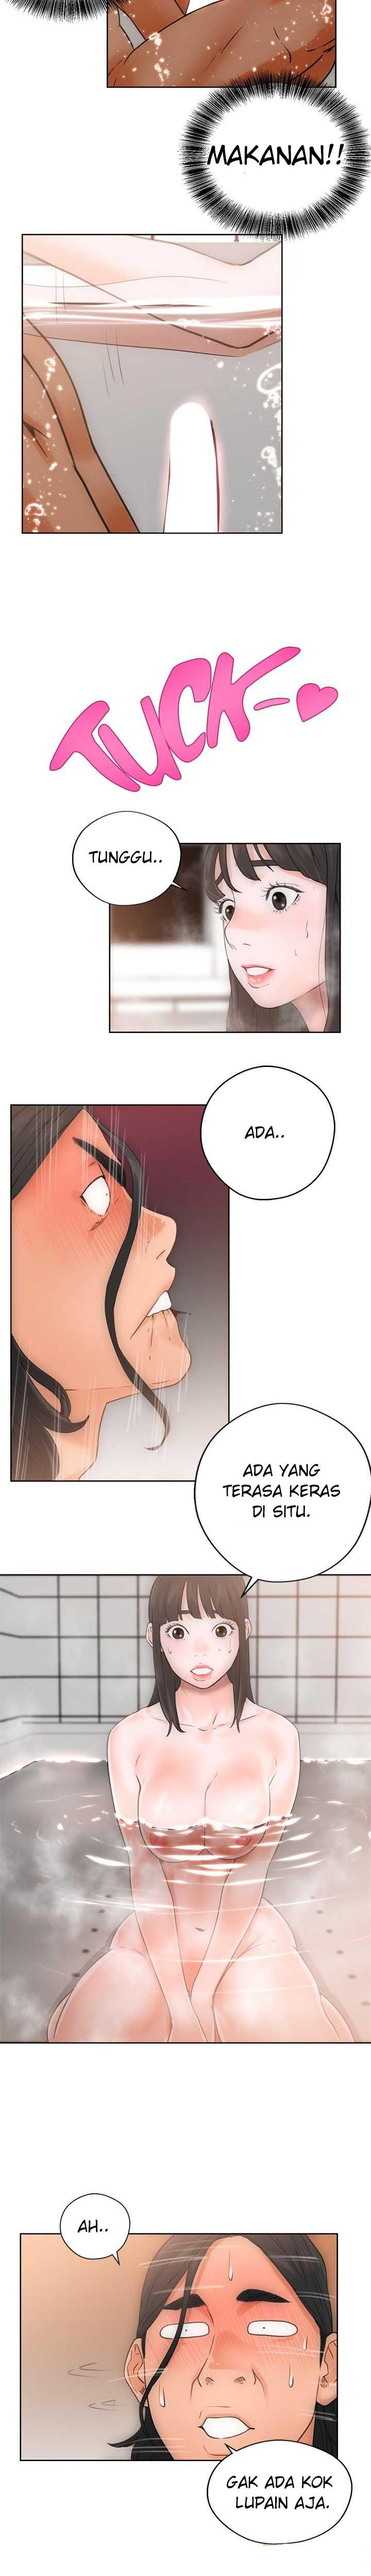 Lust Awakening Chapter 4 Bahasa Indonesia